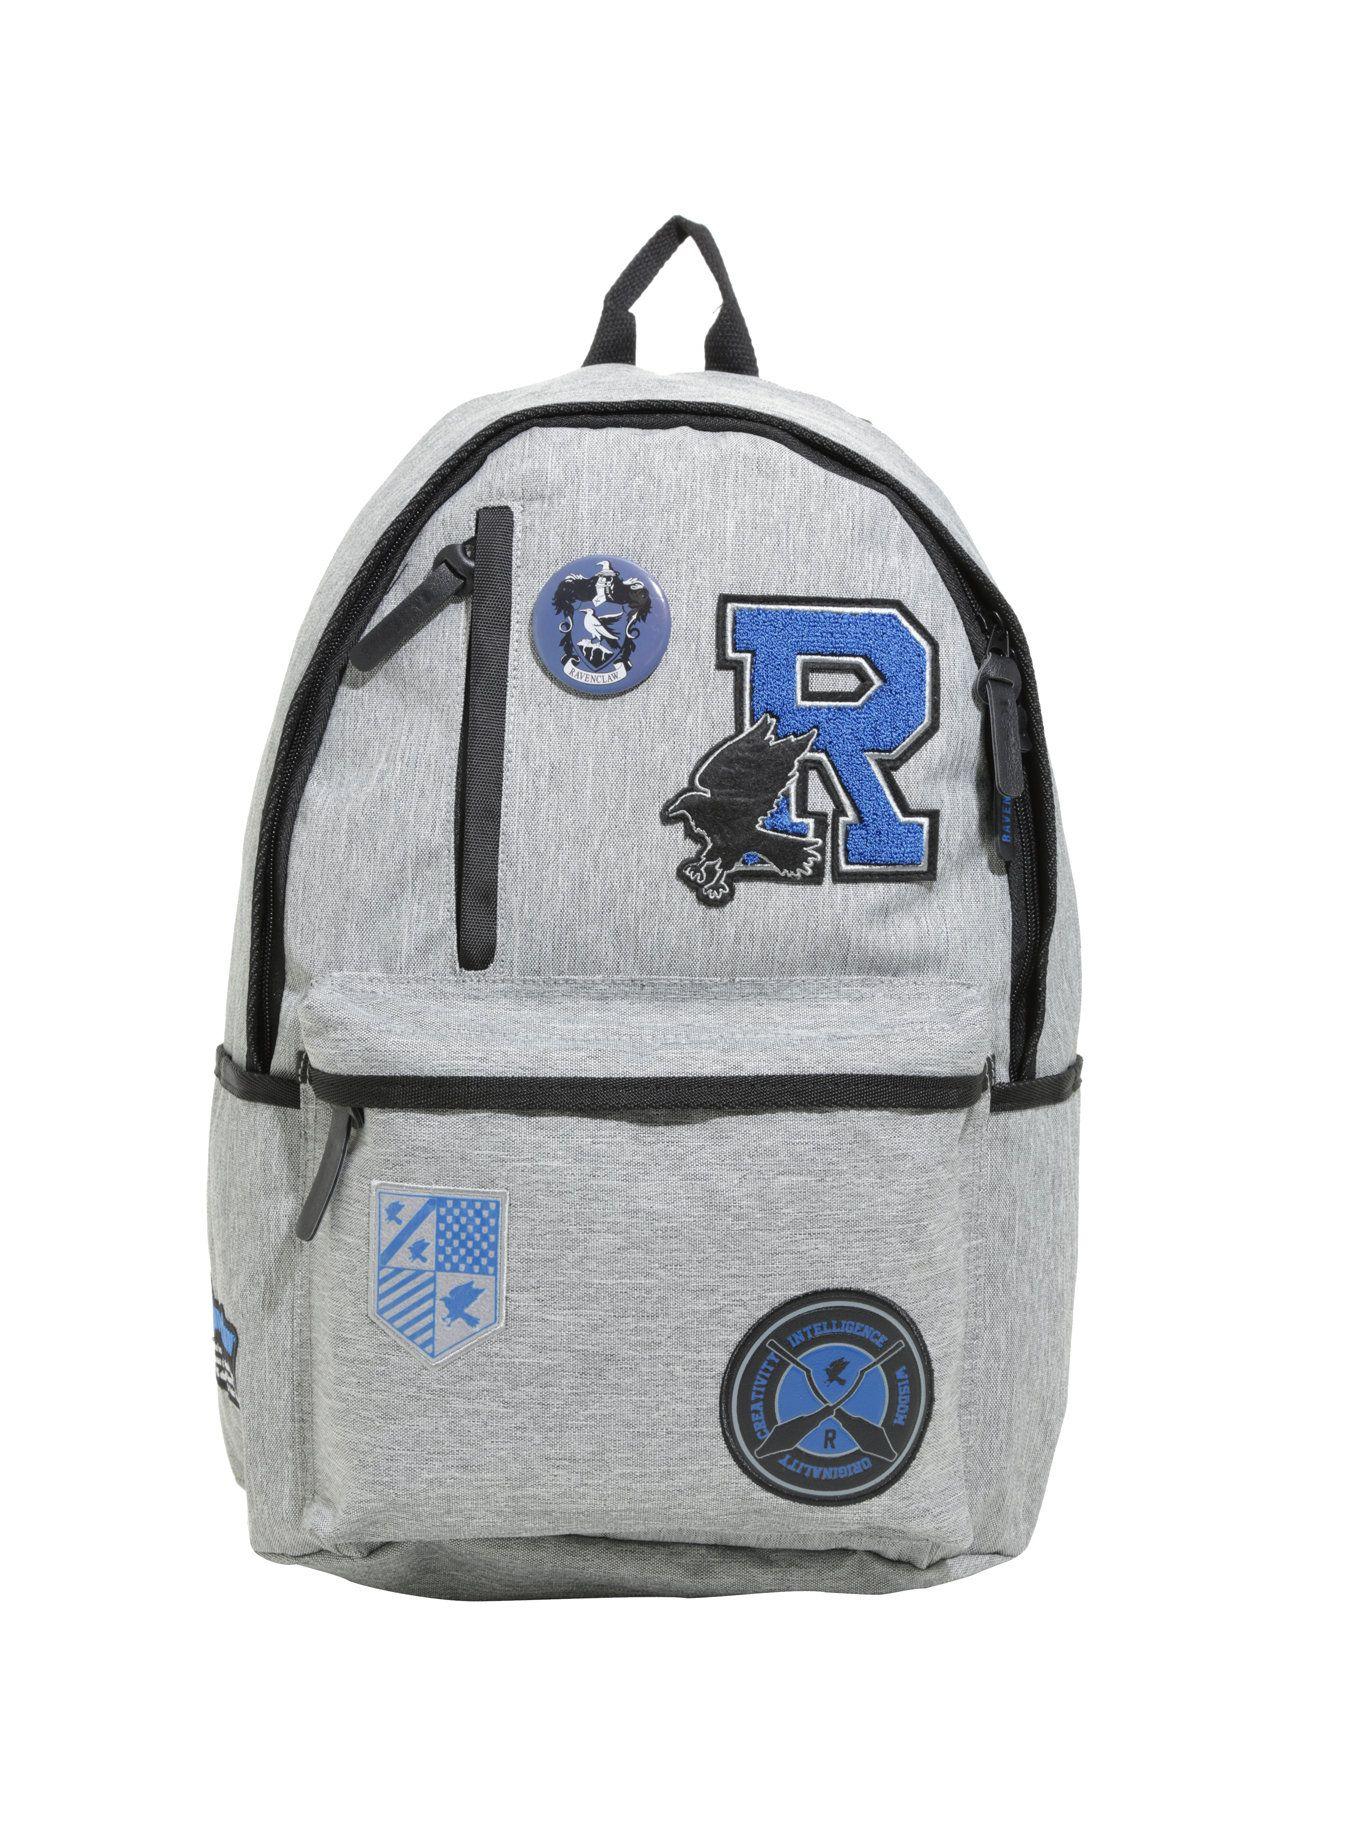 b4c72542a62 Harry Potter Ravenclaw Varsity Patch Backpack